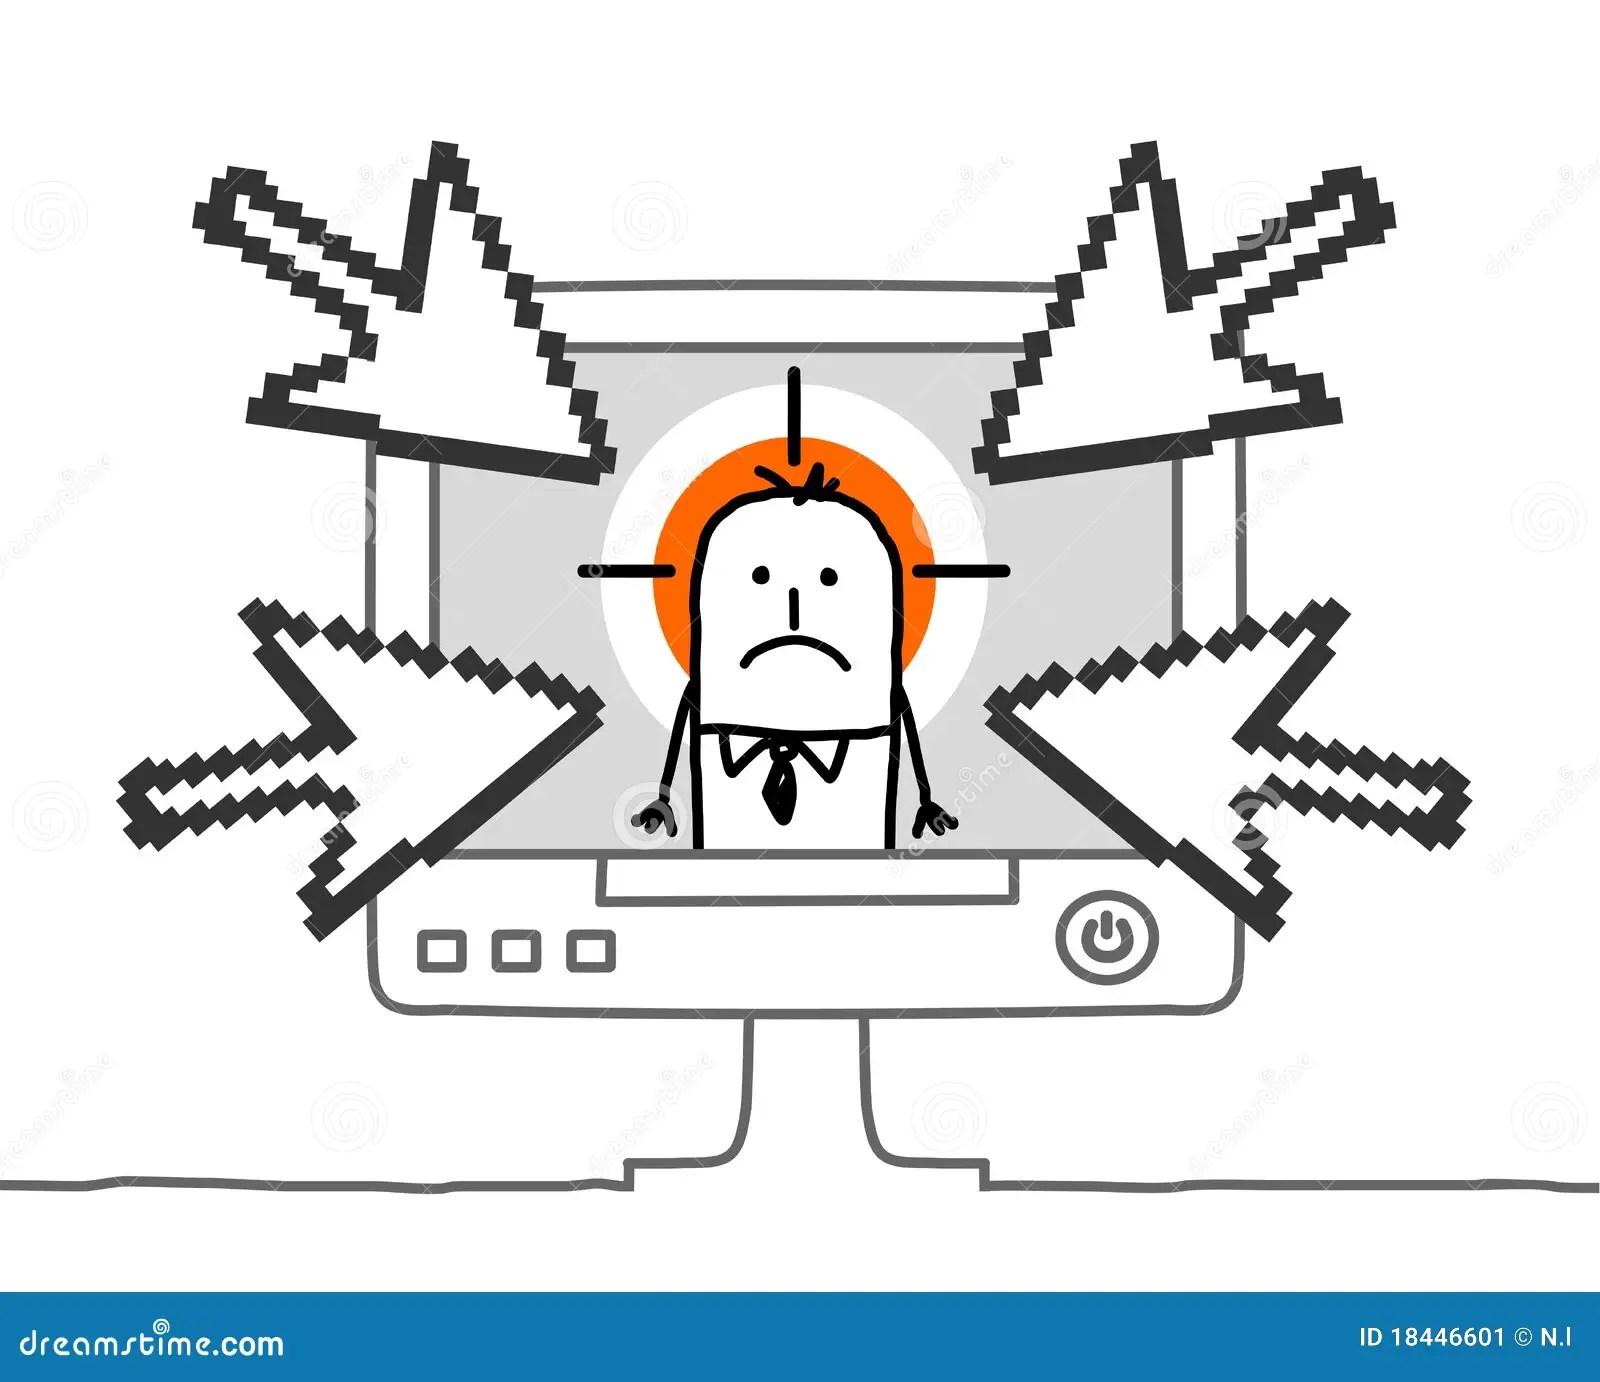 Businessman Amp Cyberbullying Stock Image